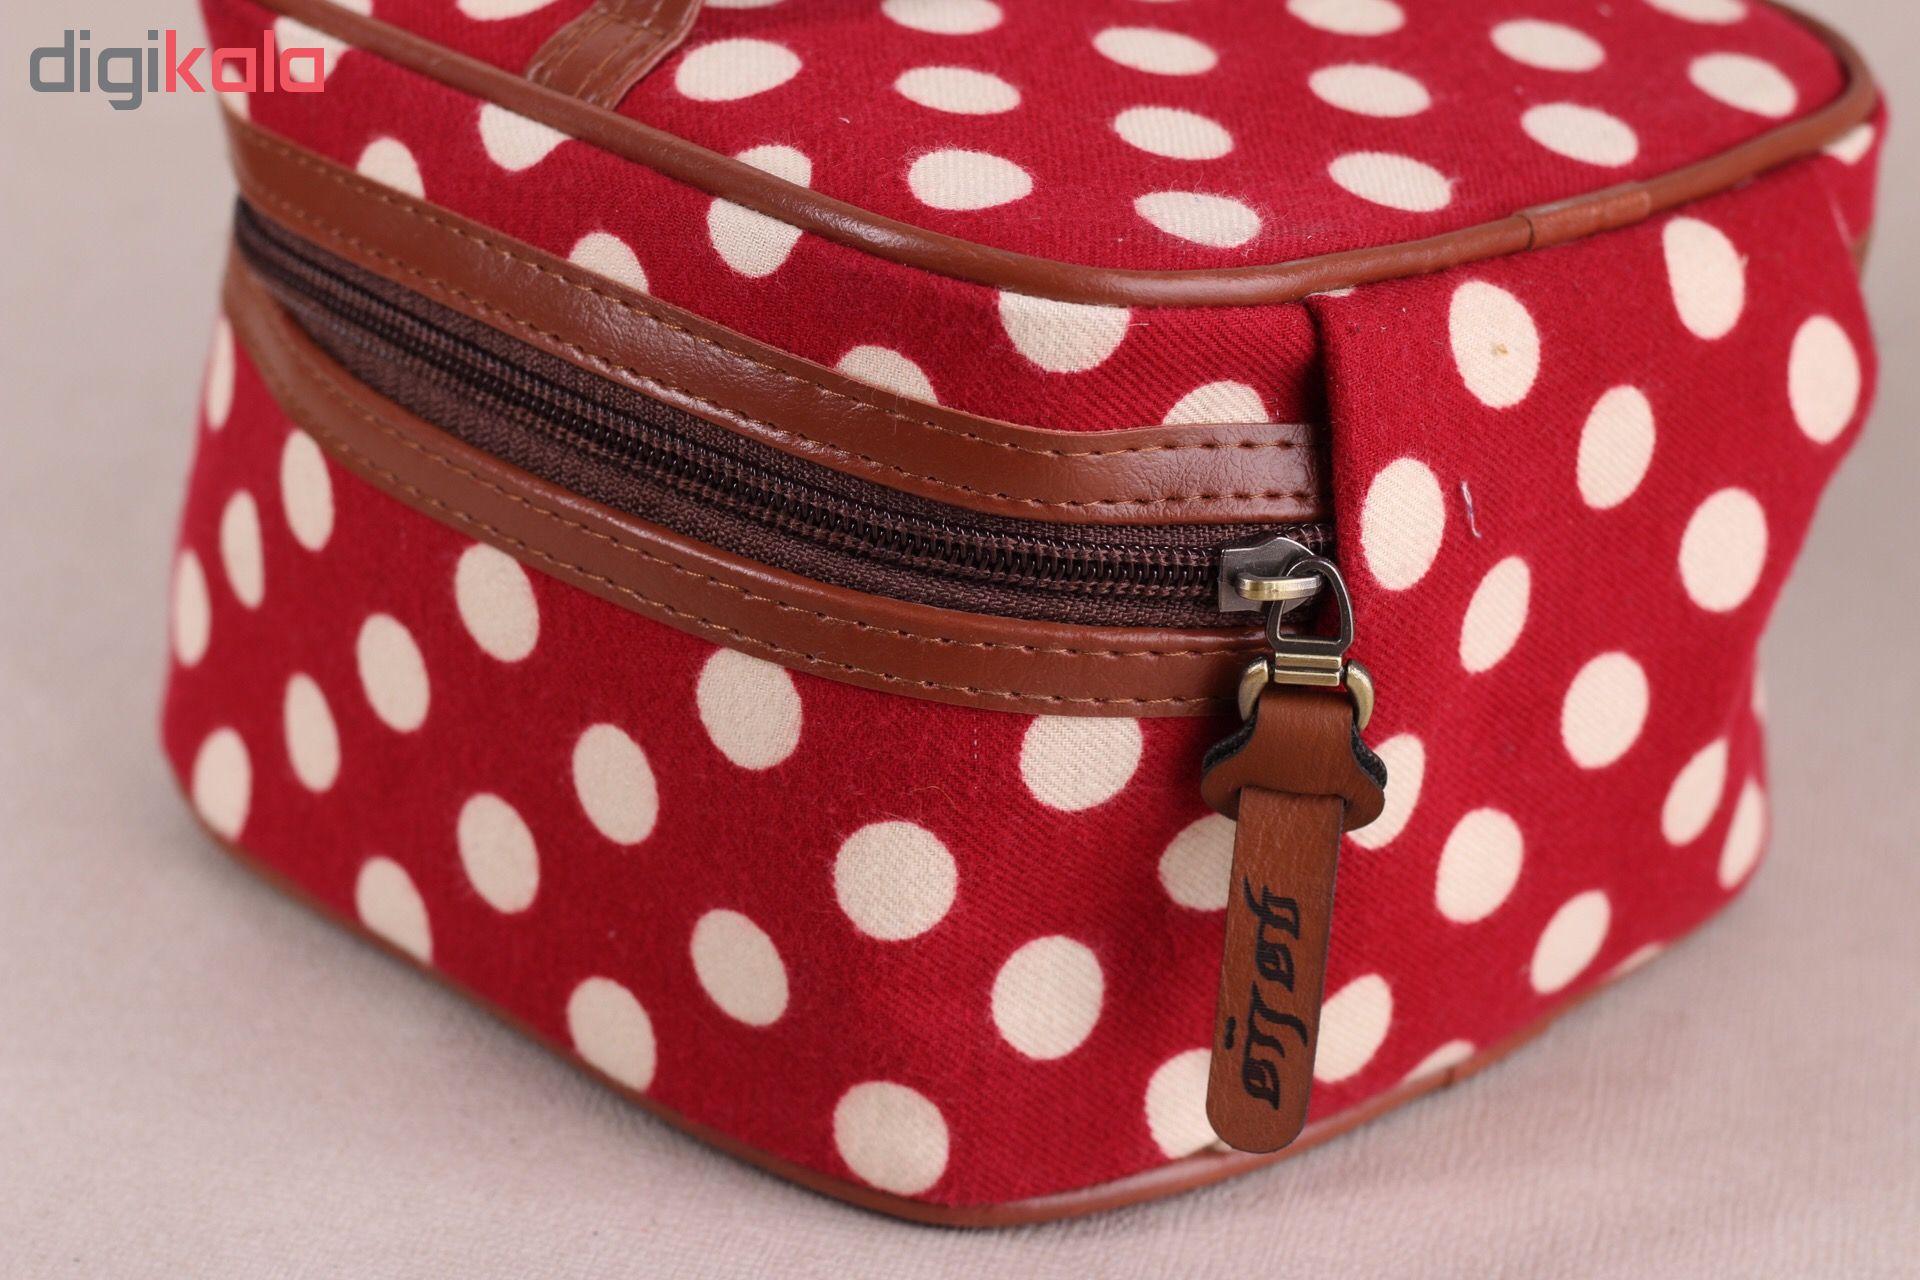 کیف لوازم آرایش هیاهو کد T10